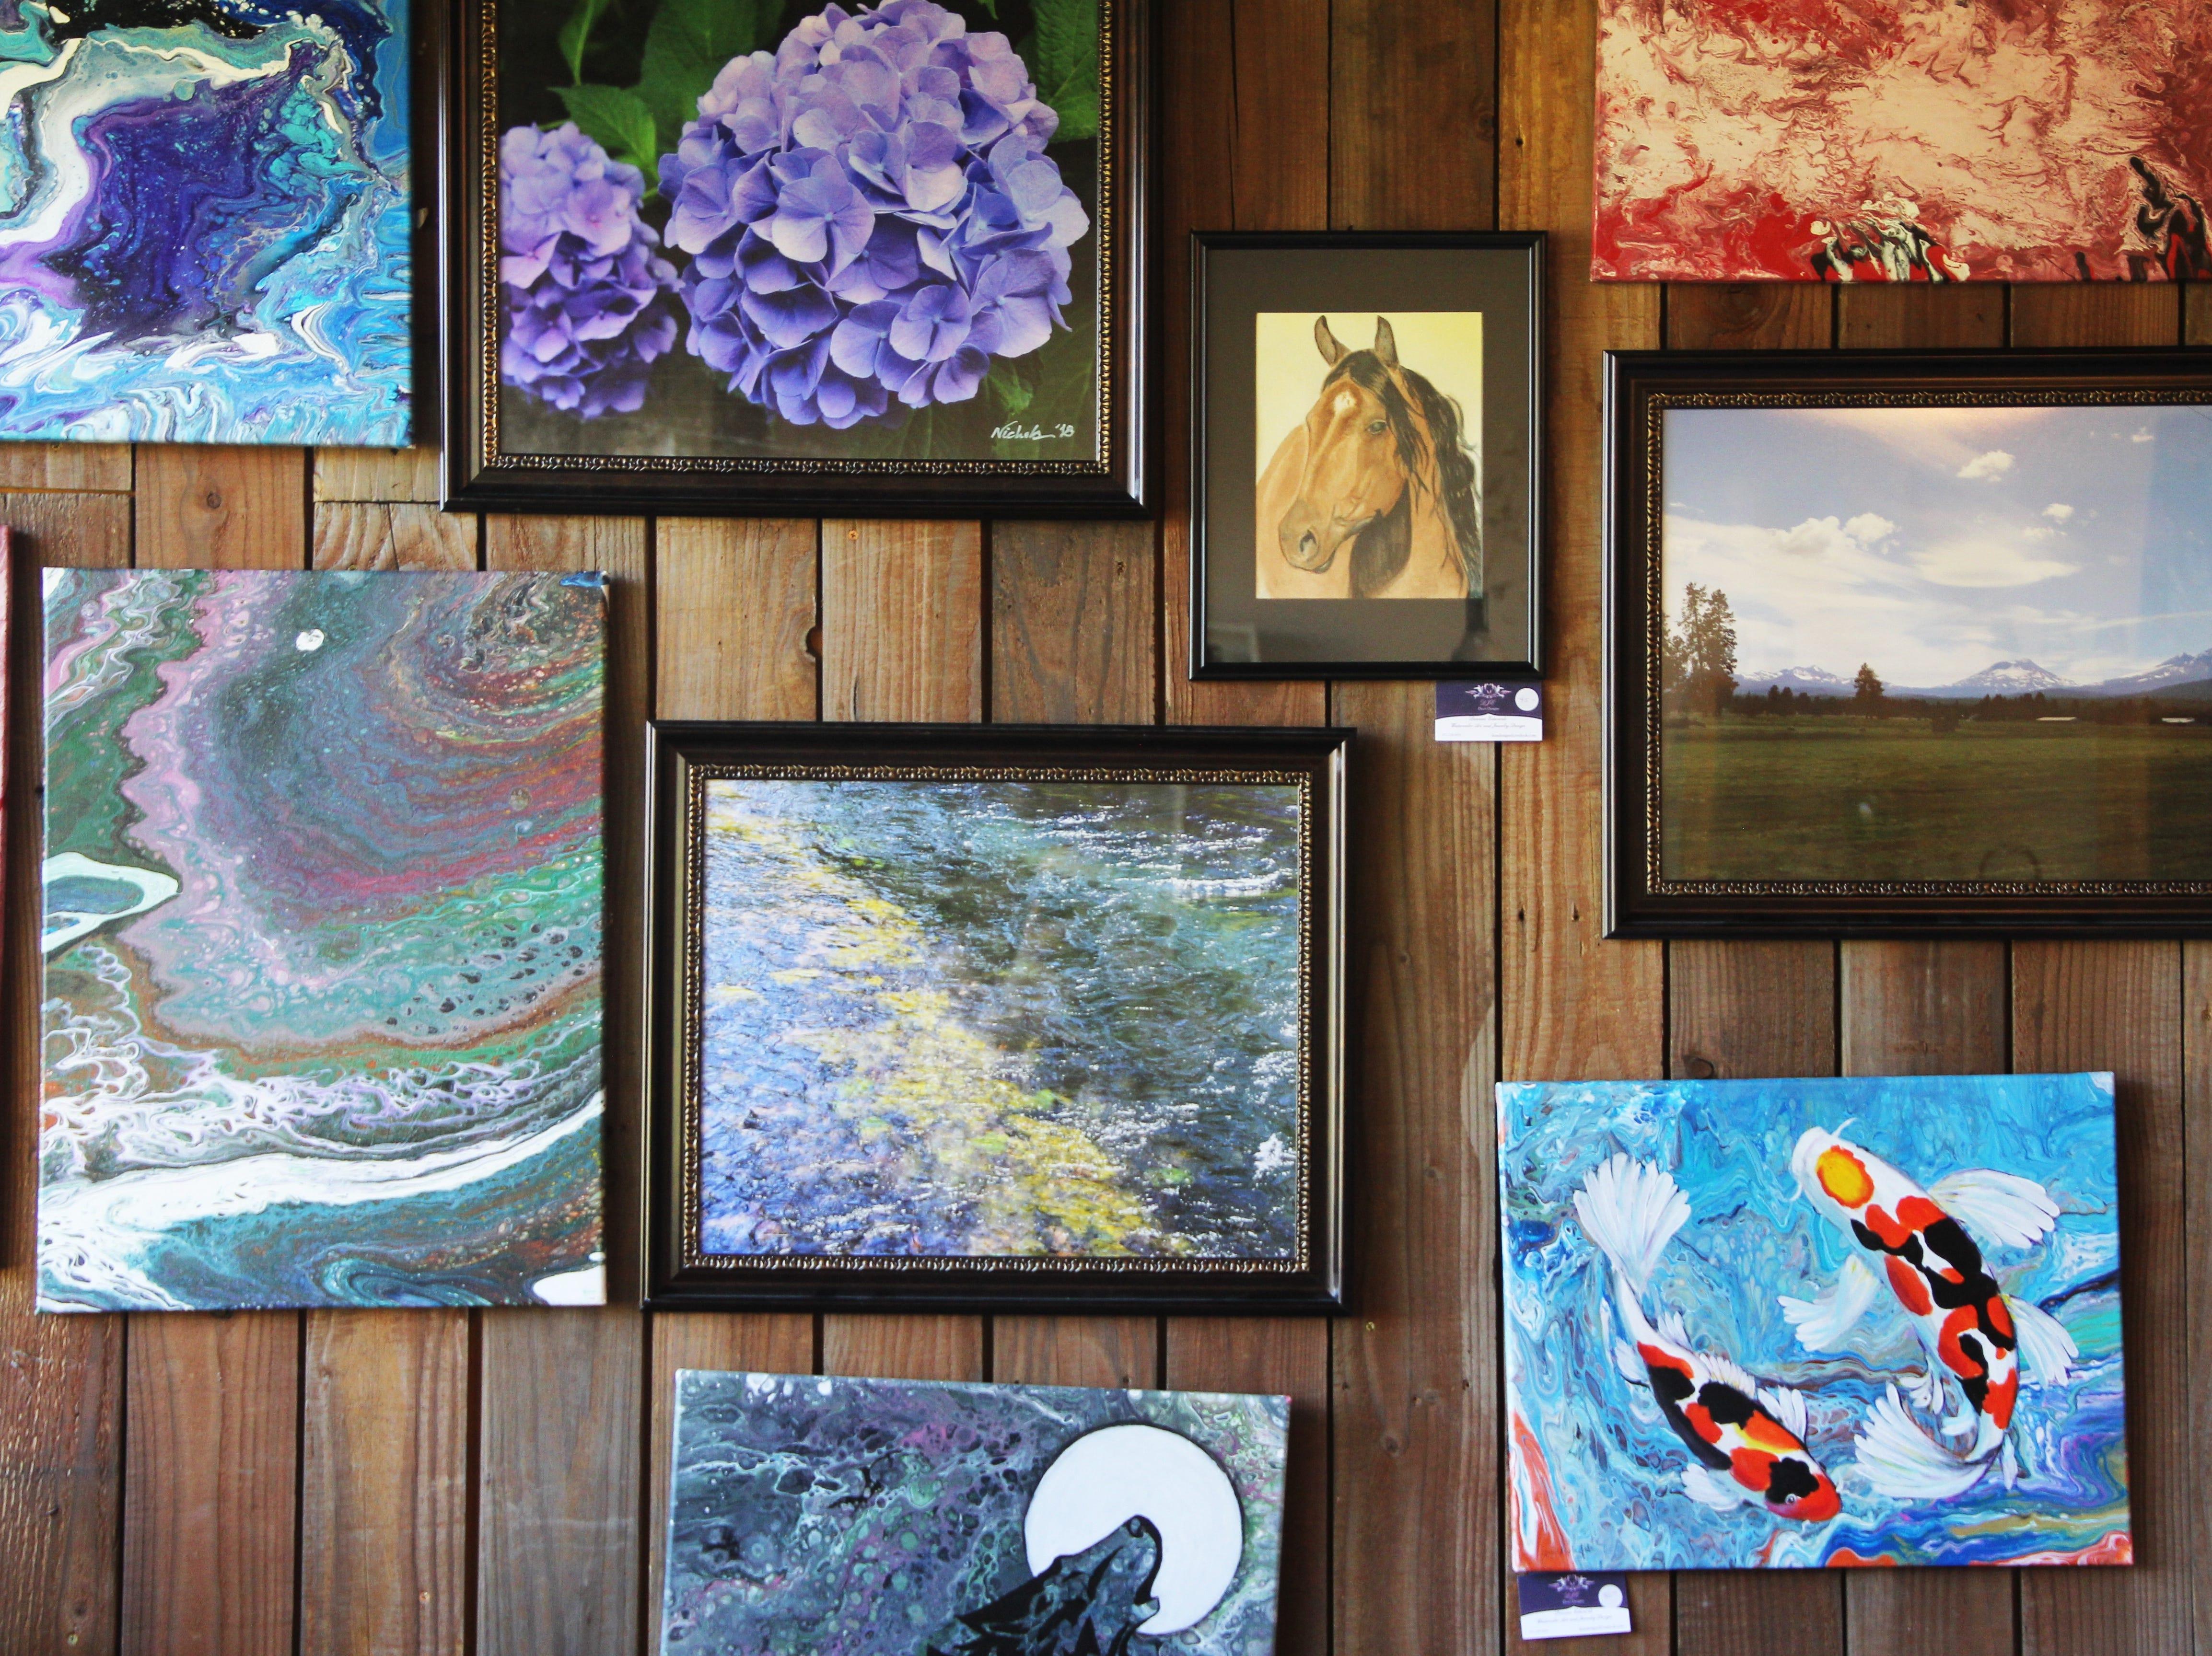 Framed art hung on the walls at the Willamette Art Center's Empty Bowls fundraiser on Saturday, Nov. 17.